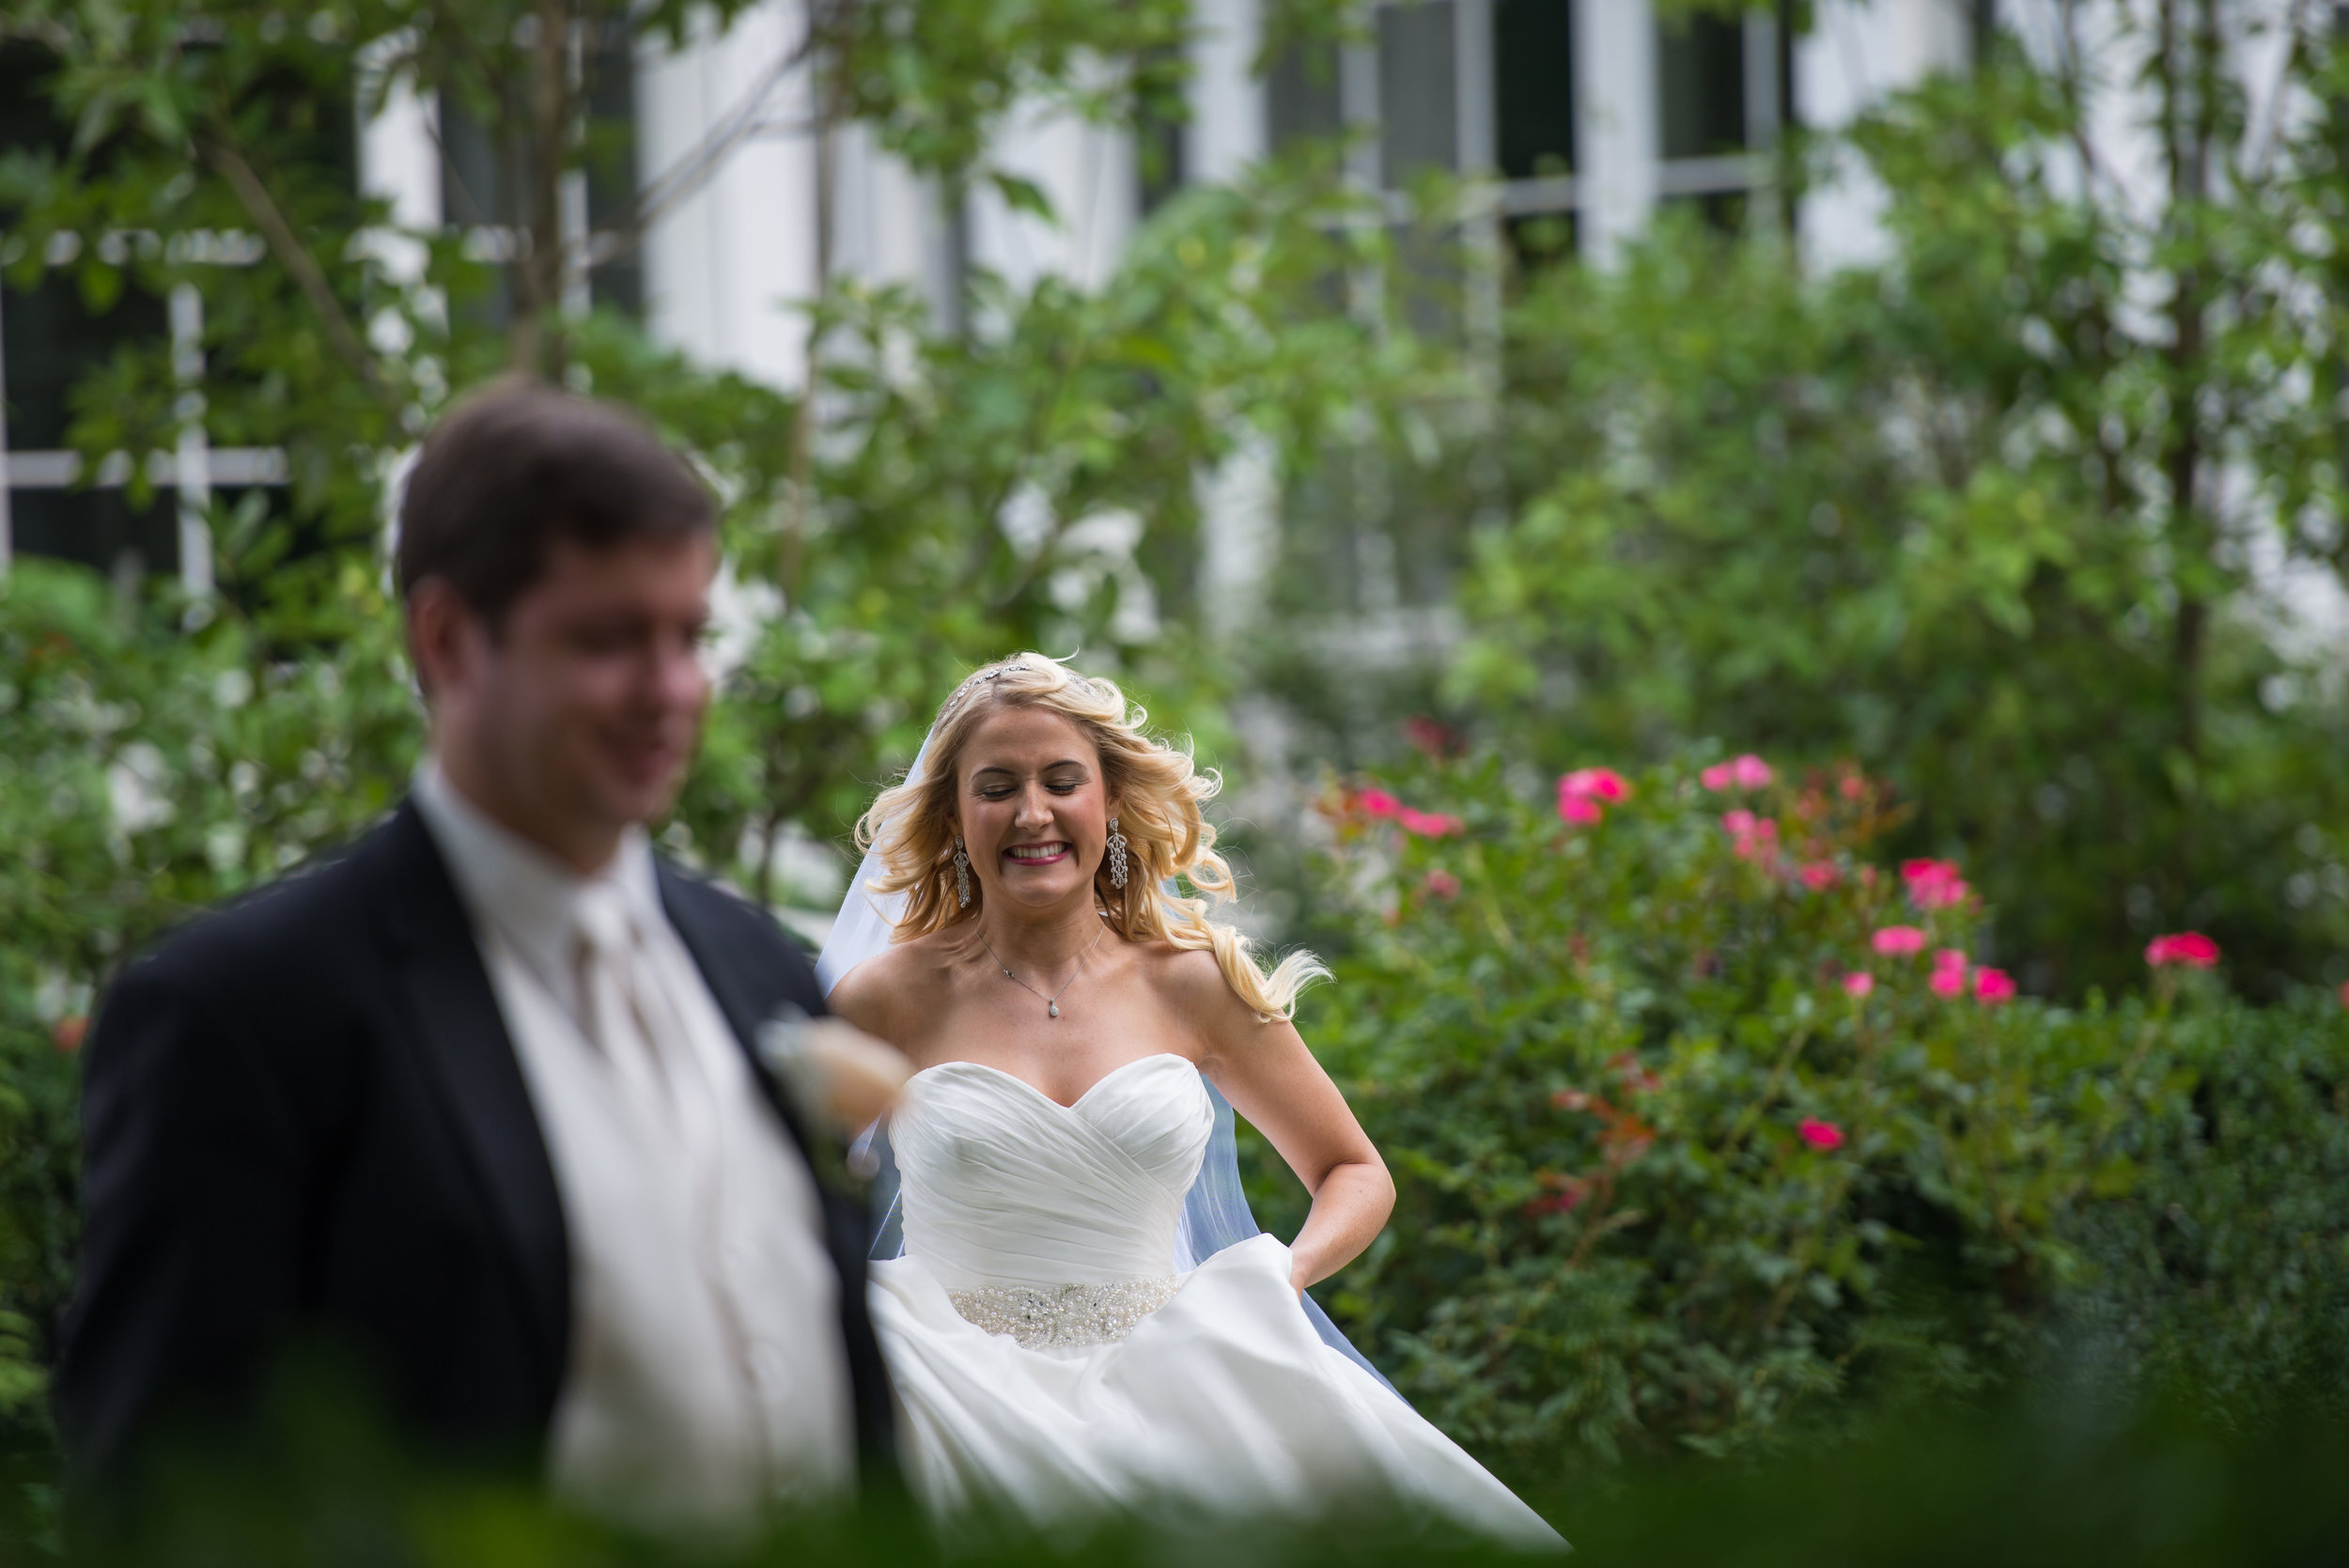 Wedding First Look Photos00918.jpg